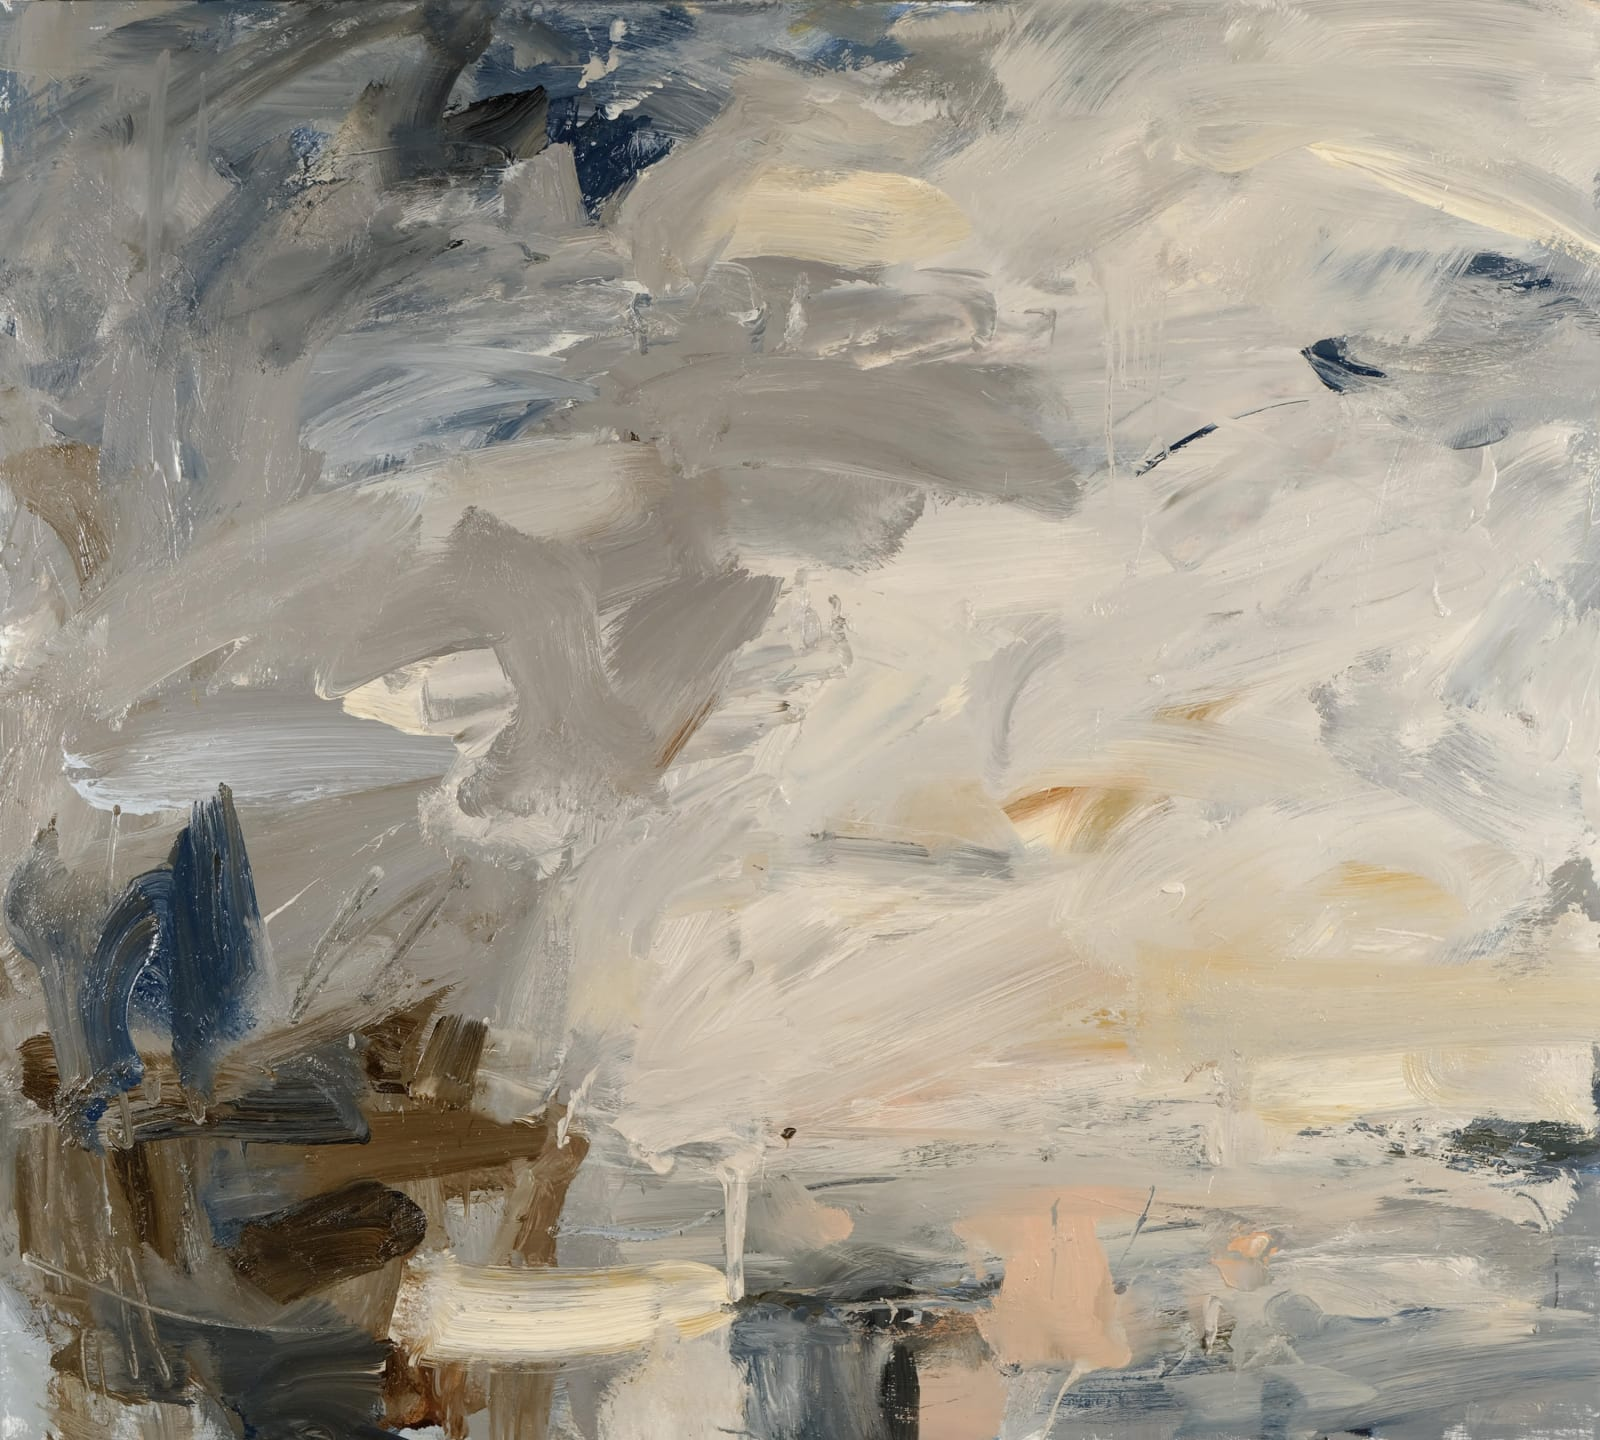 Sky Gleam, Zennor oil on canvas 90cm x 100cm